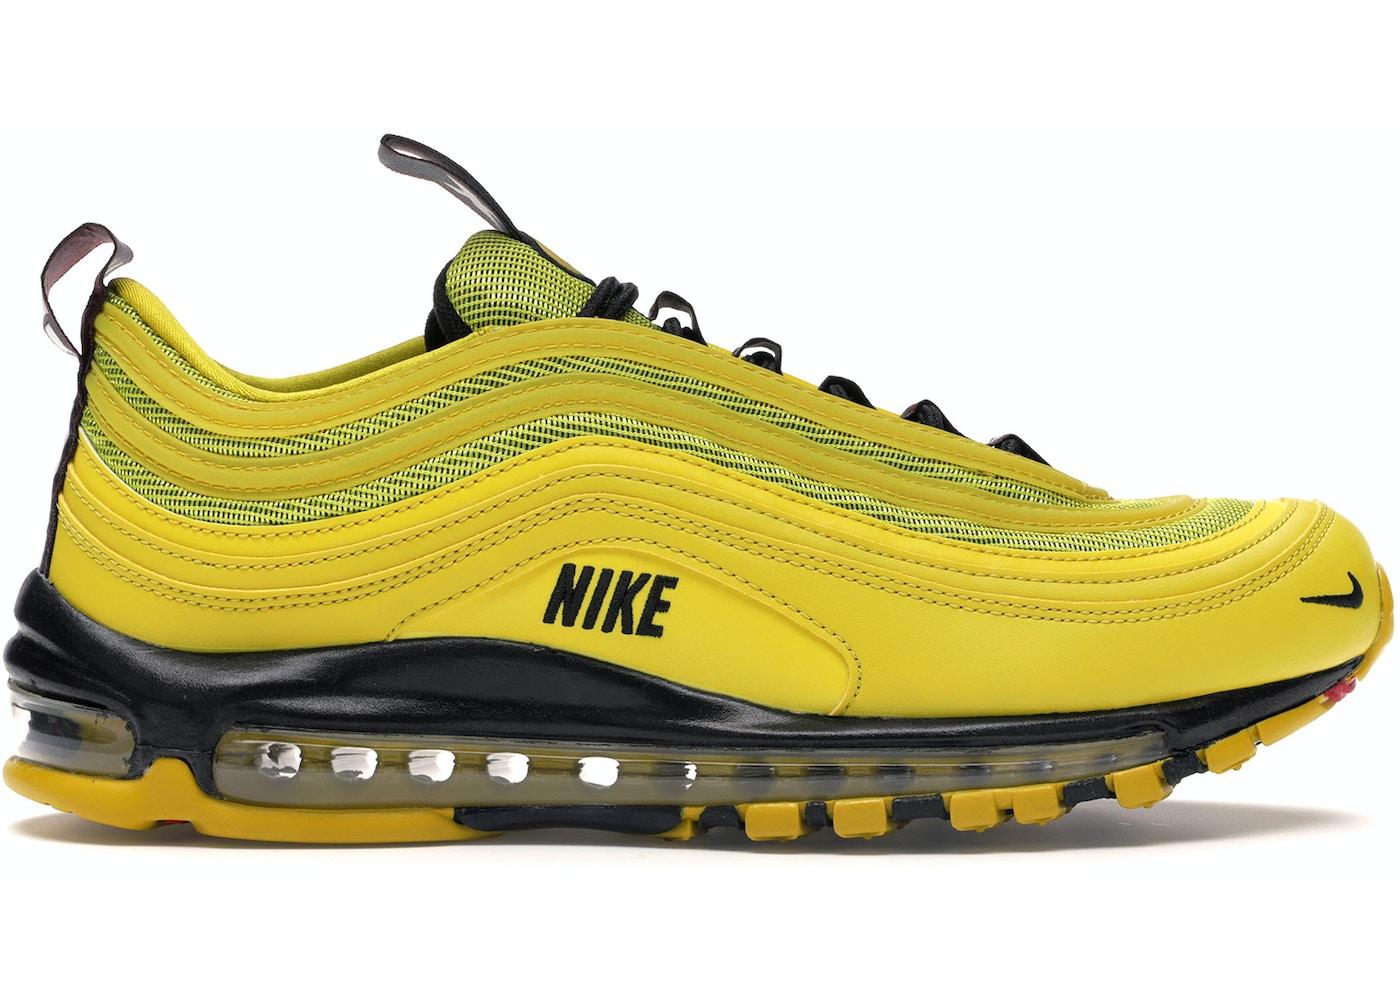 Nike air max 97 off white release date st enrihertva.gq